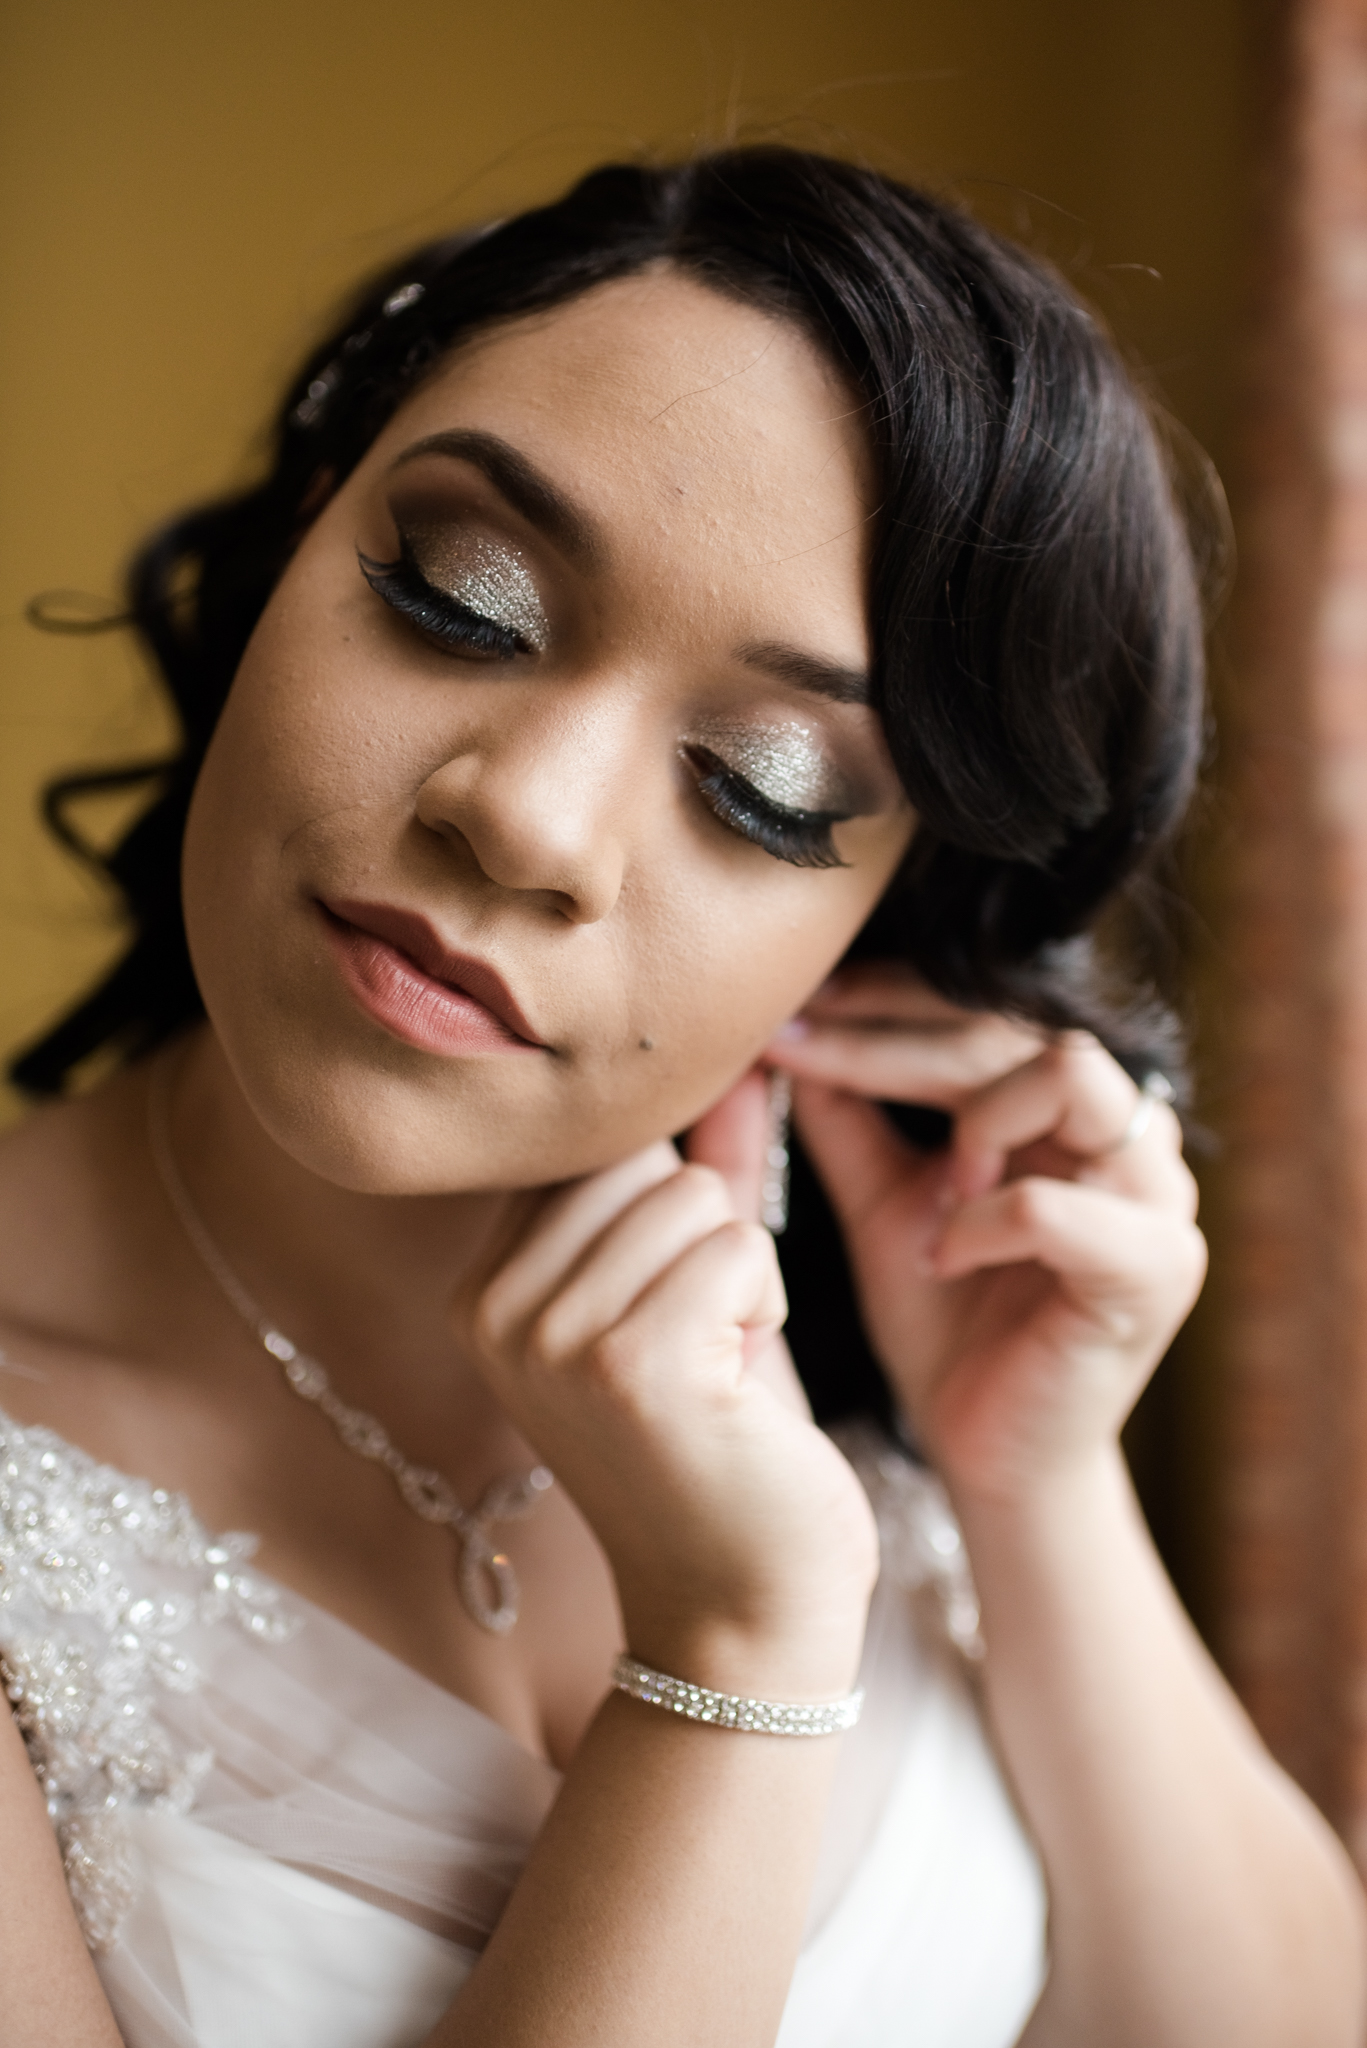 gibsonville-wedding-photography-004.jpg